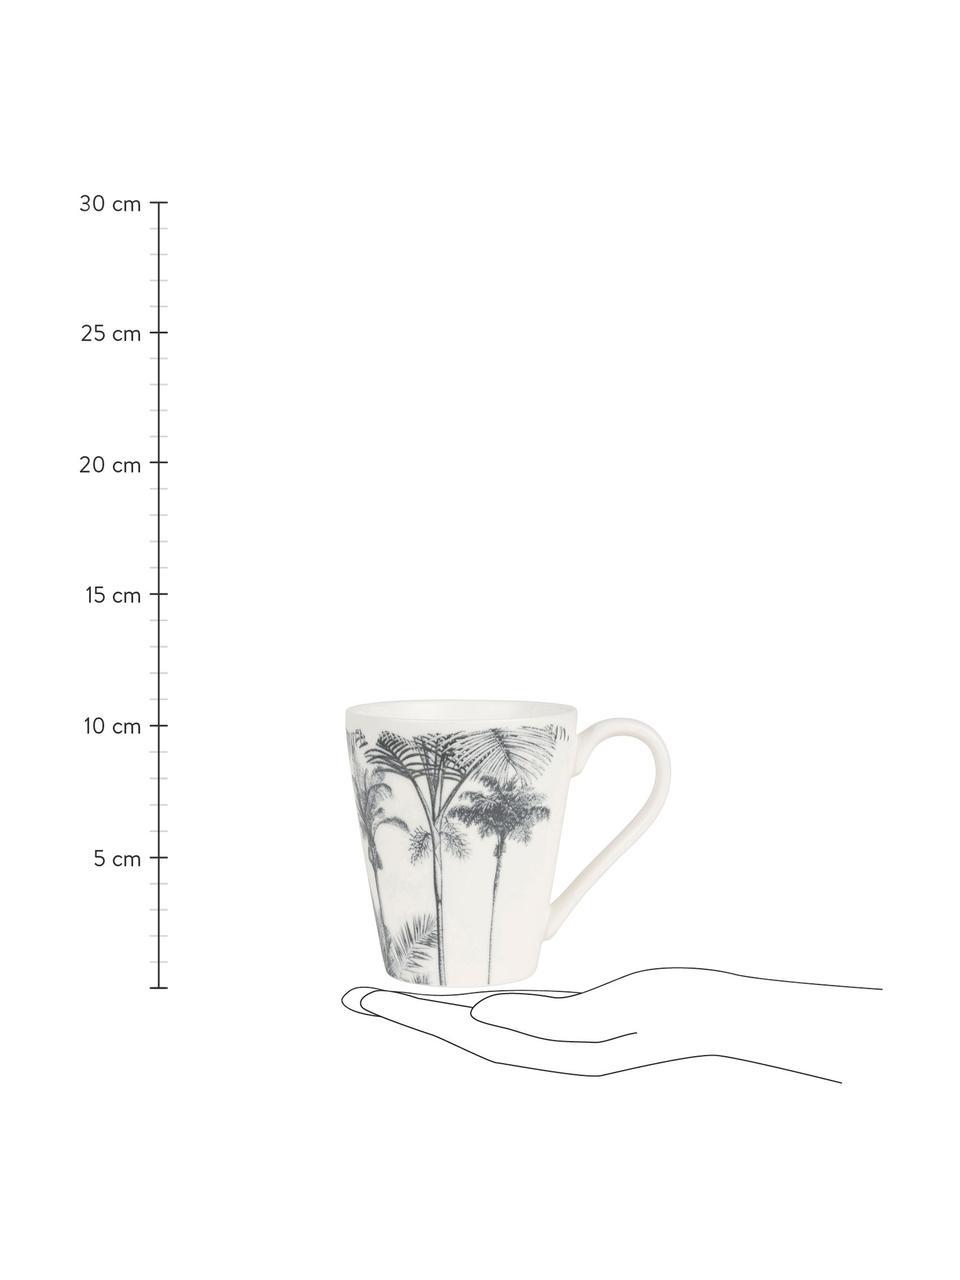 Tassen Papaye mit Palmenmotiv, 4 Stück, Porzellan, Weiß, Schwarz, Ø 10 x H 11 cm